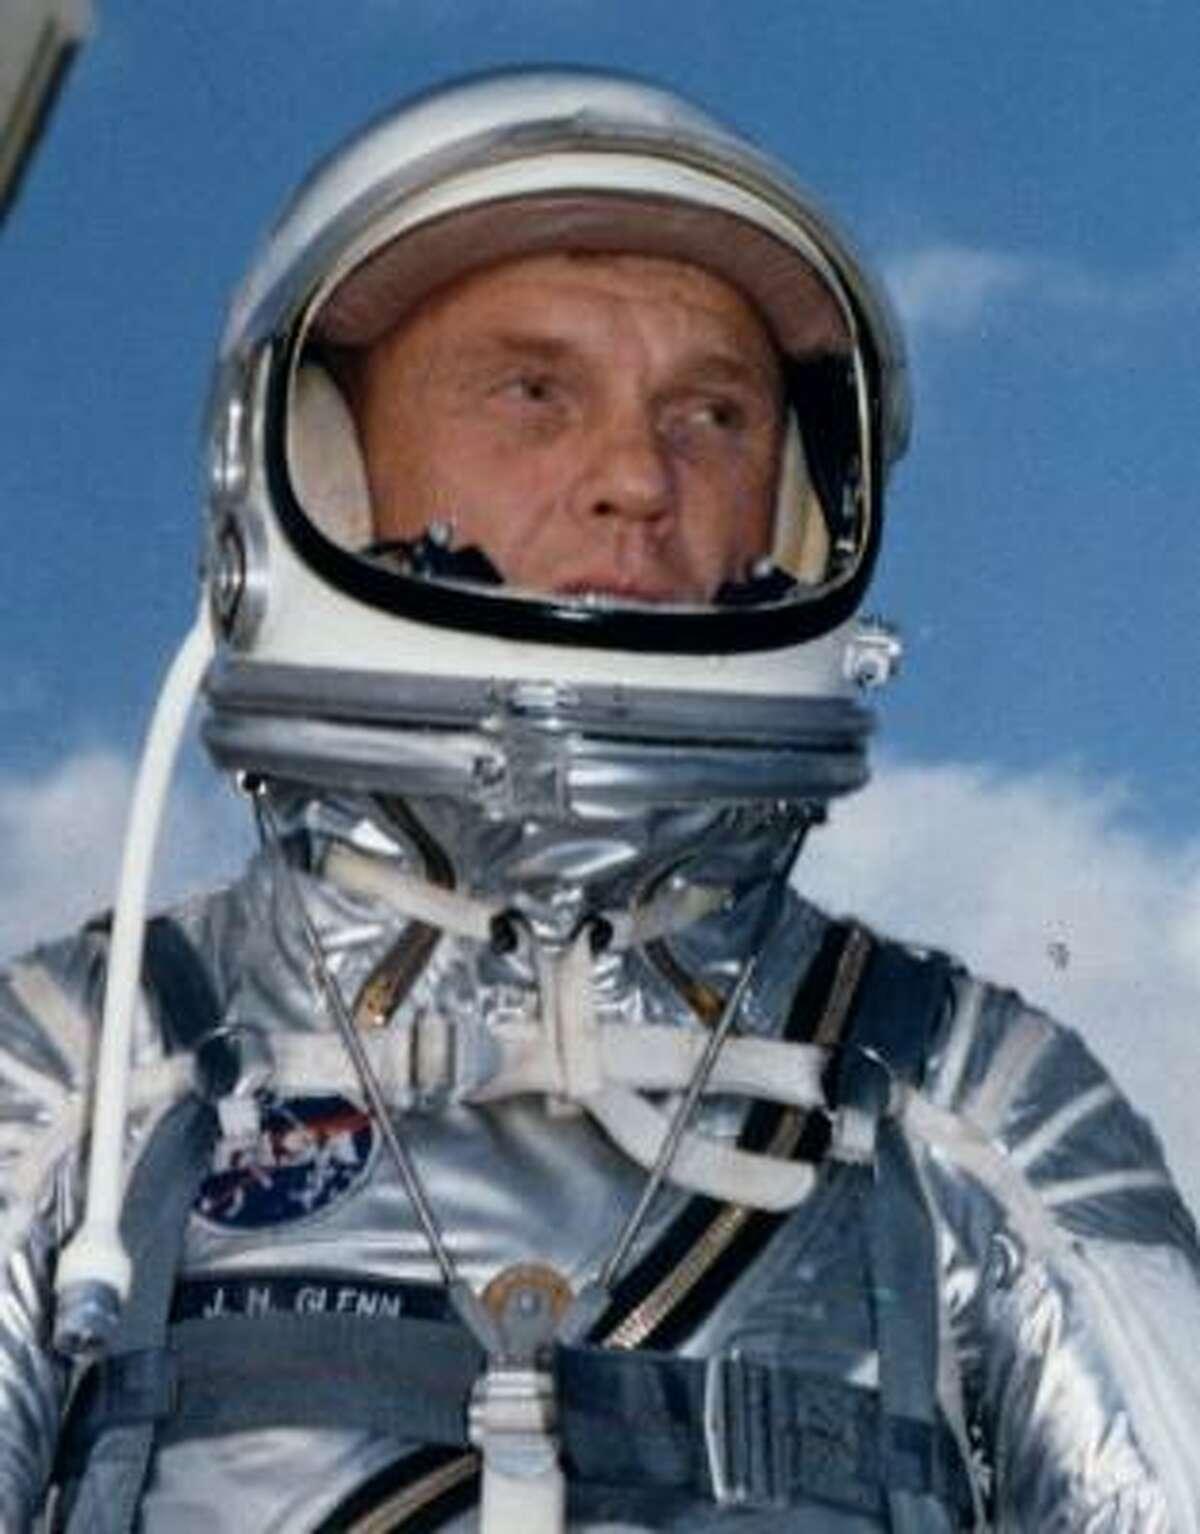 Mercury astronaut John Glenn wears his pressure suit in the early 1960s.